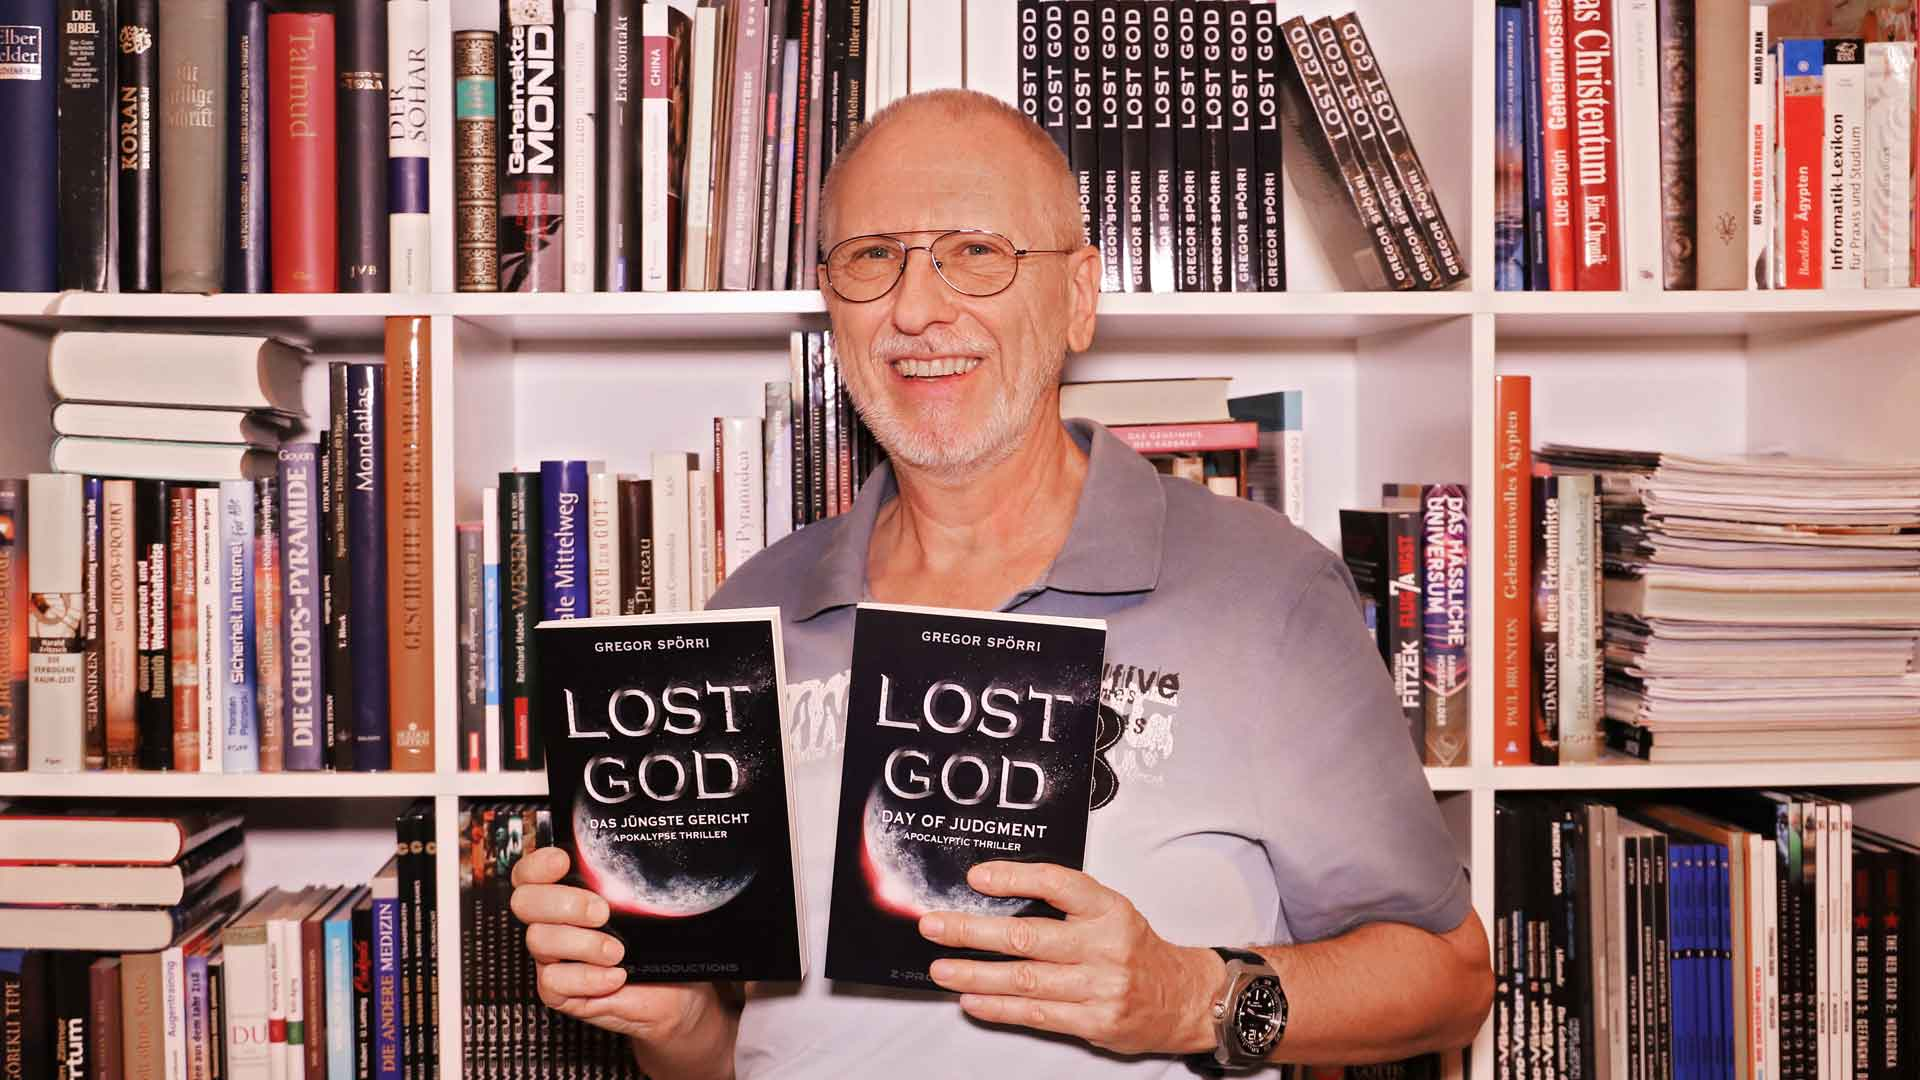 Gregor Spörri, author of LOST GOD.